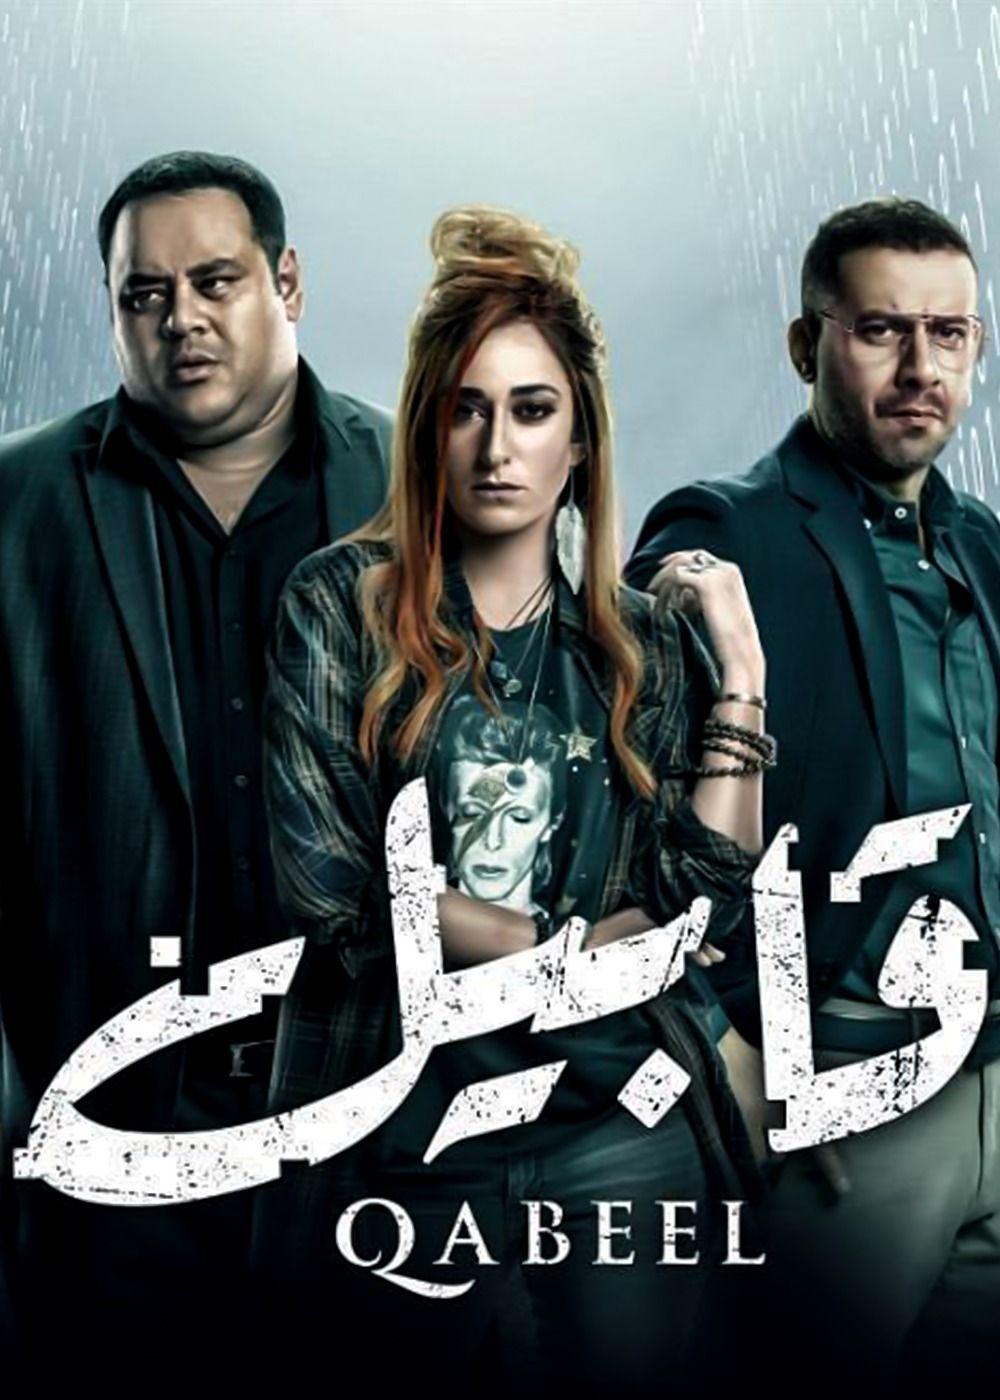 موعد وتوقيت عرض مسلسل قابيل على قناة إم بي سي مصر رمضان 2019 Music Tv Series Online Classical Music